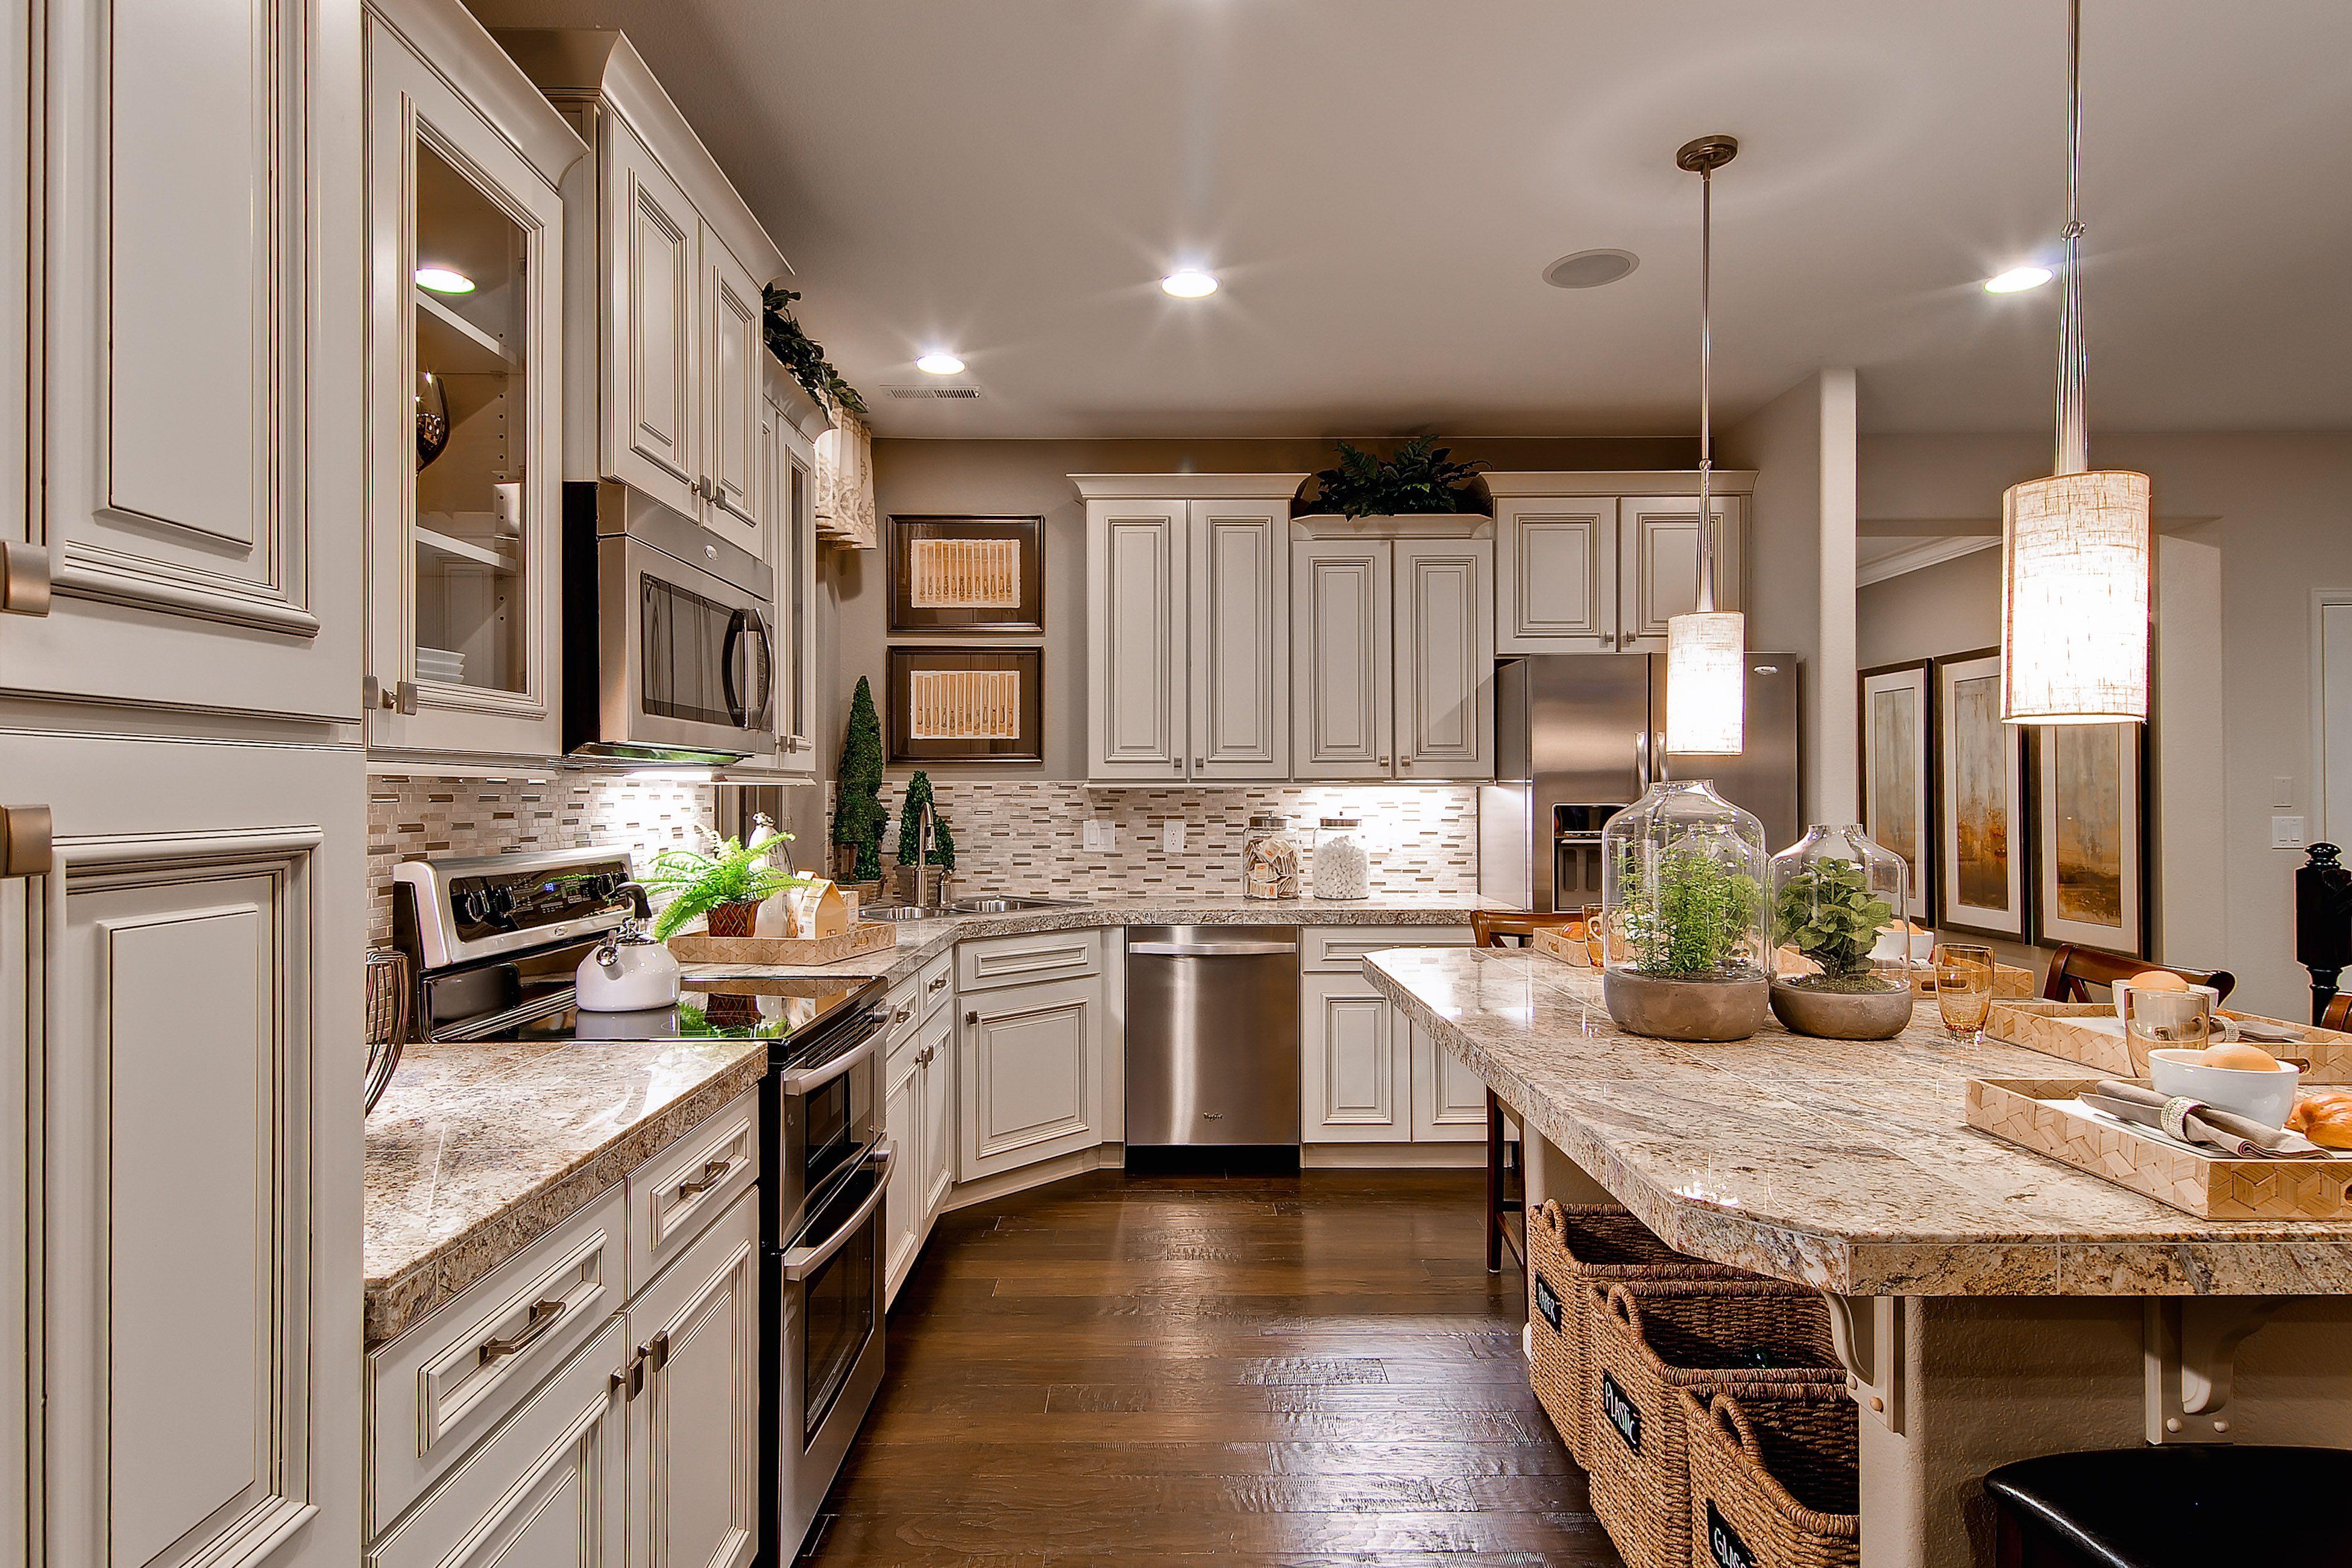 Cypress Kitchen Oakwood homes, Home design decor, New